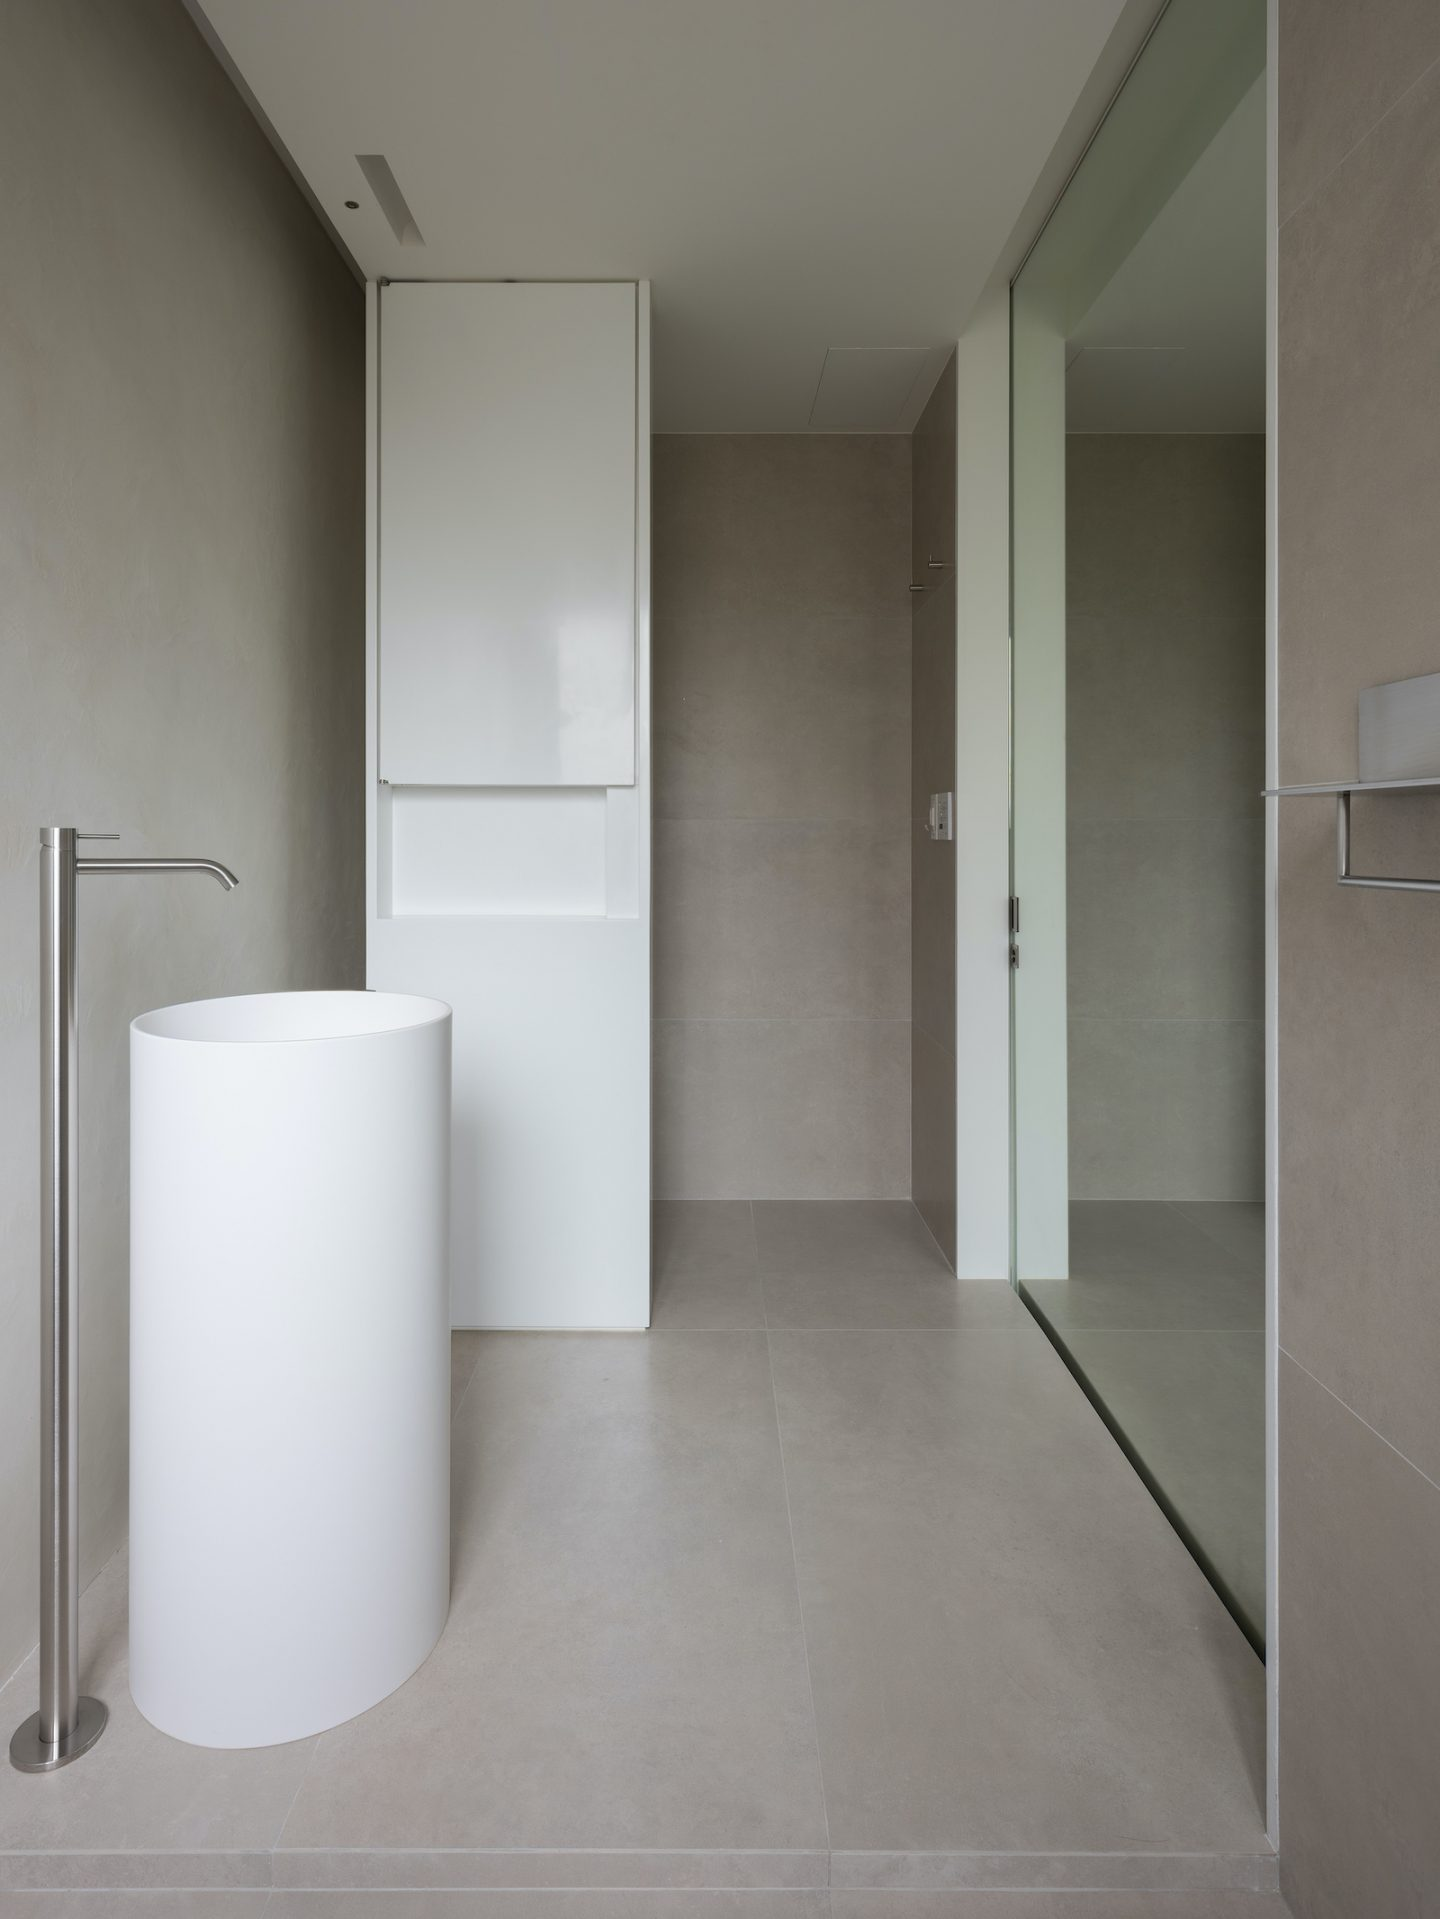 IGNANT-Architecture-Marty-Chou-KOA-Apartment-08